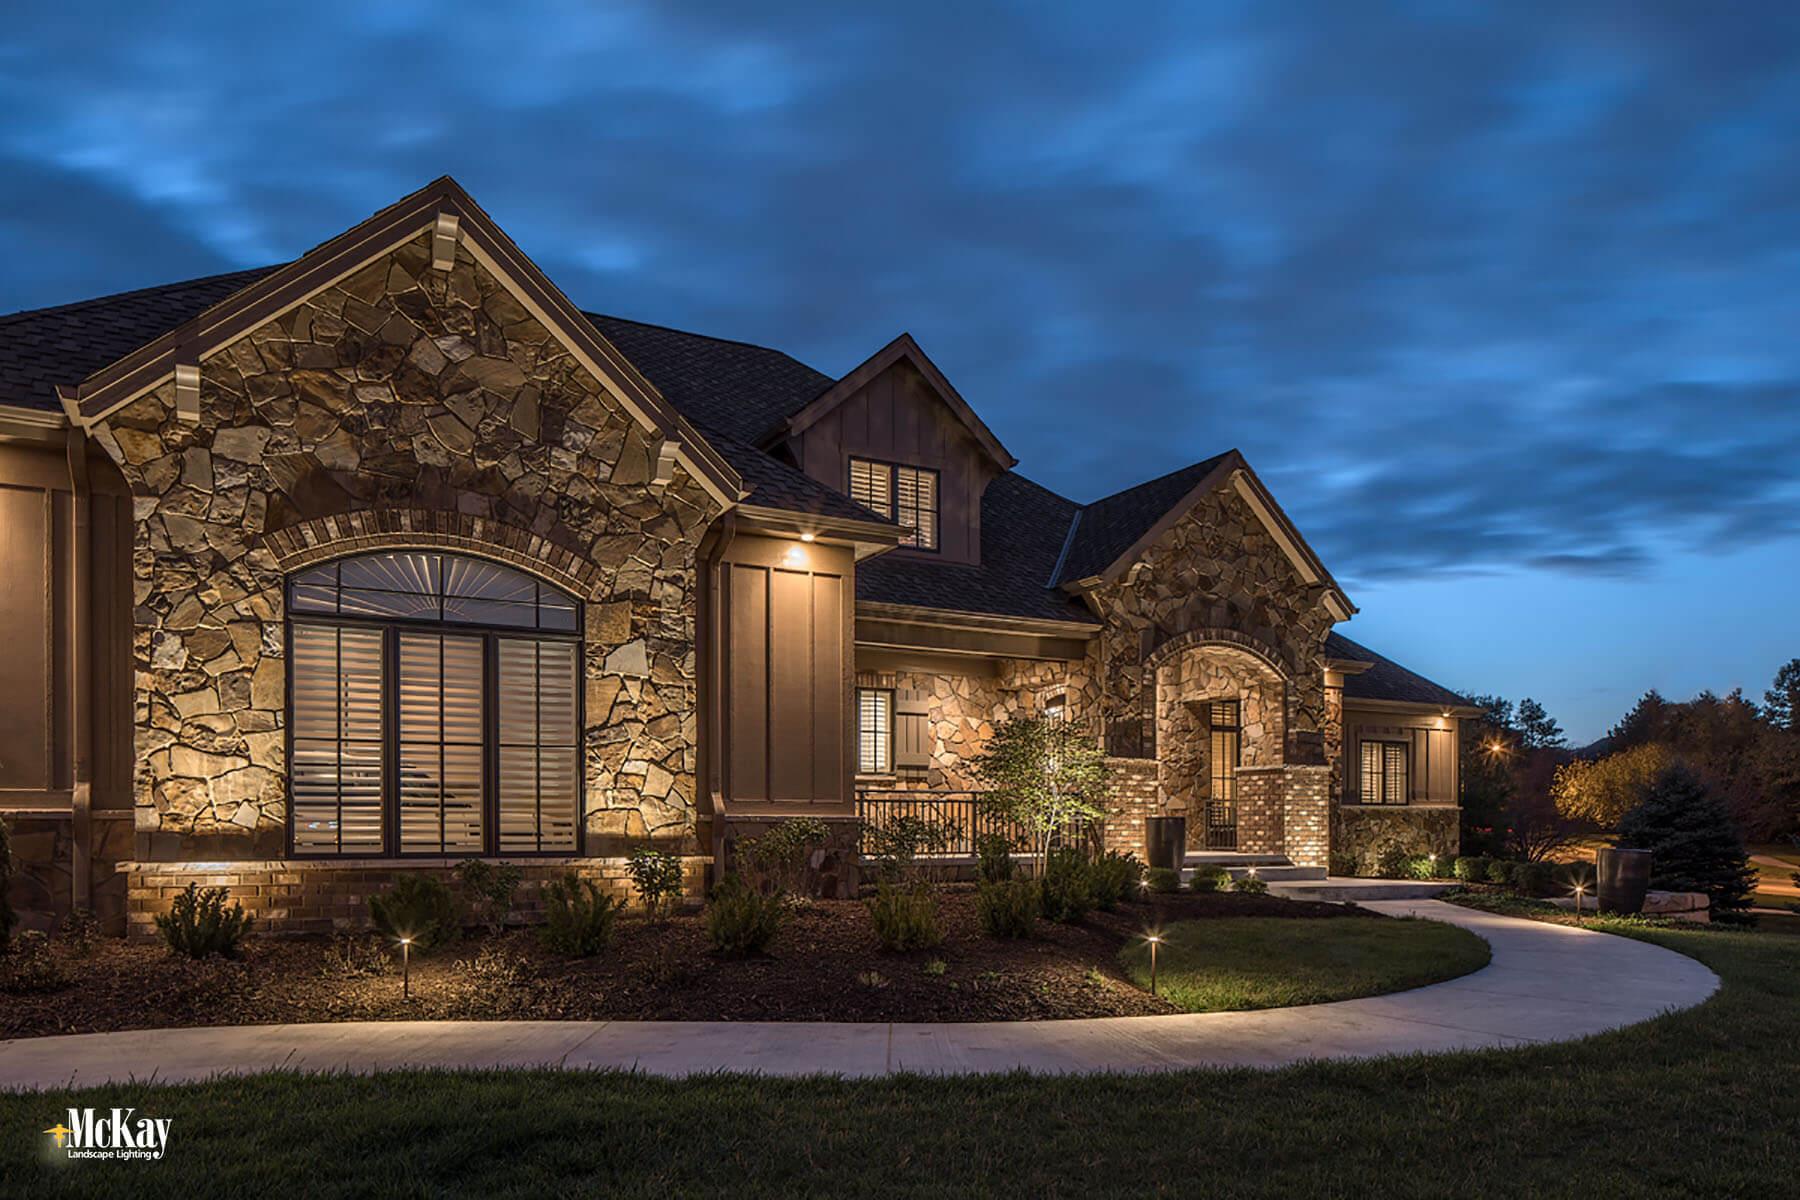 Residential Security Lighting Omaha Nebraska McKay Landscape Lighting B 02